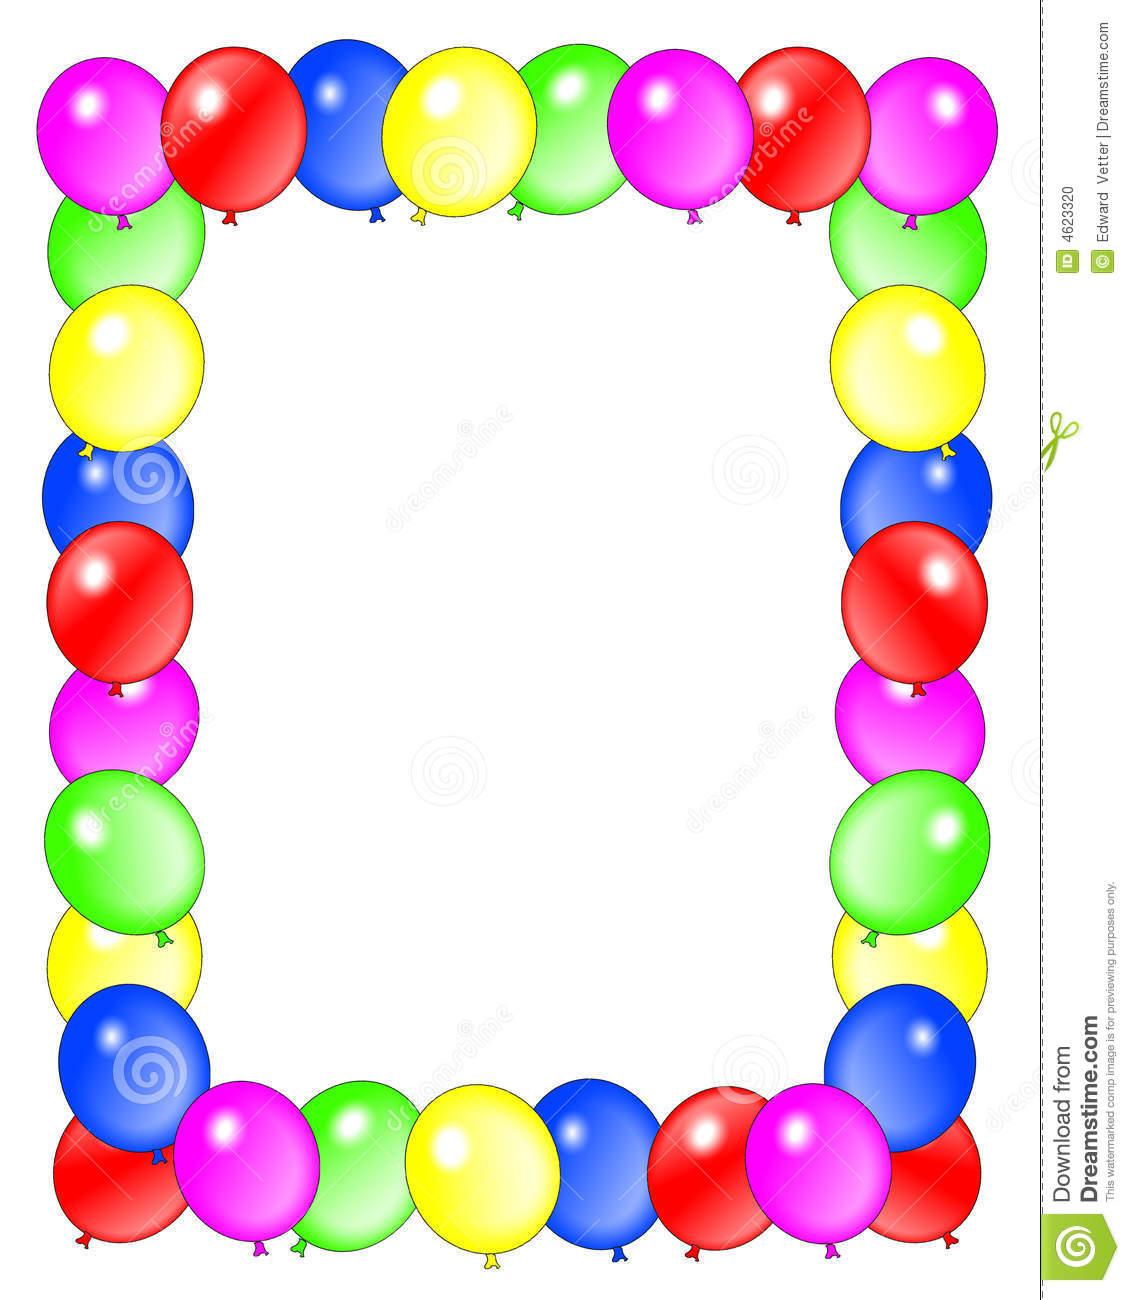 happy birthday frame clipart - Clipground